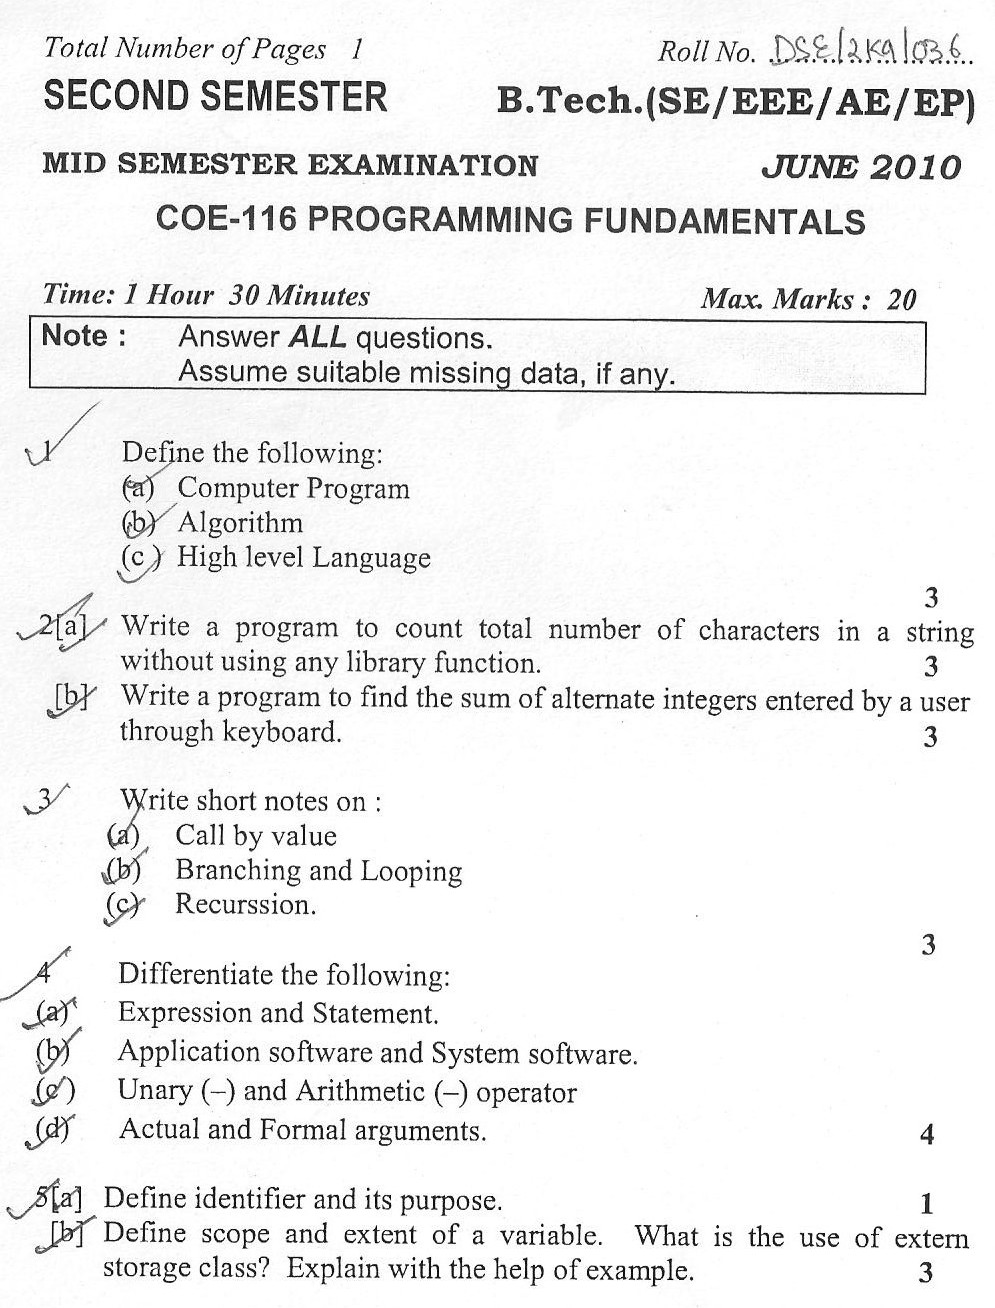 DTU Question Papers 2010 – 2 Semester - Mid Sem - COE-116